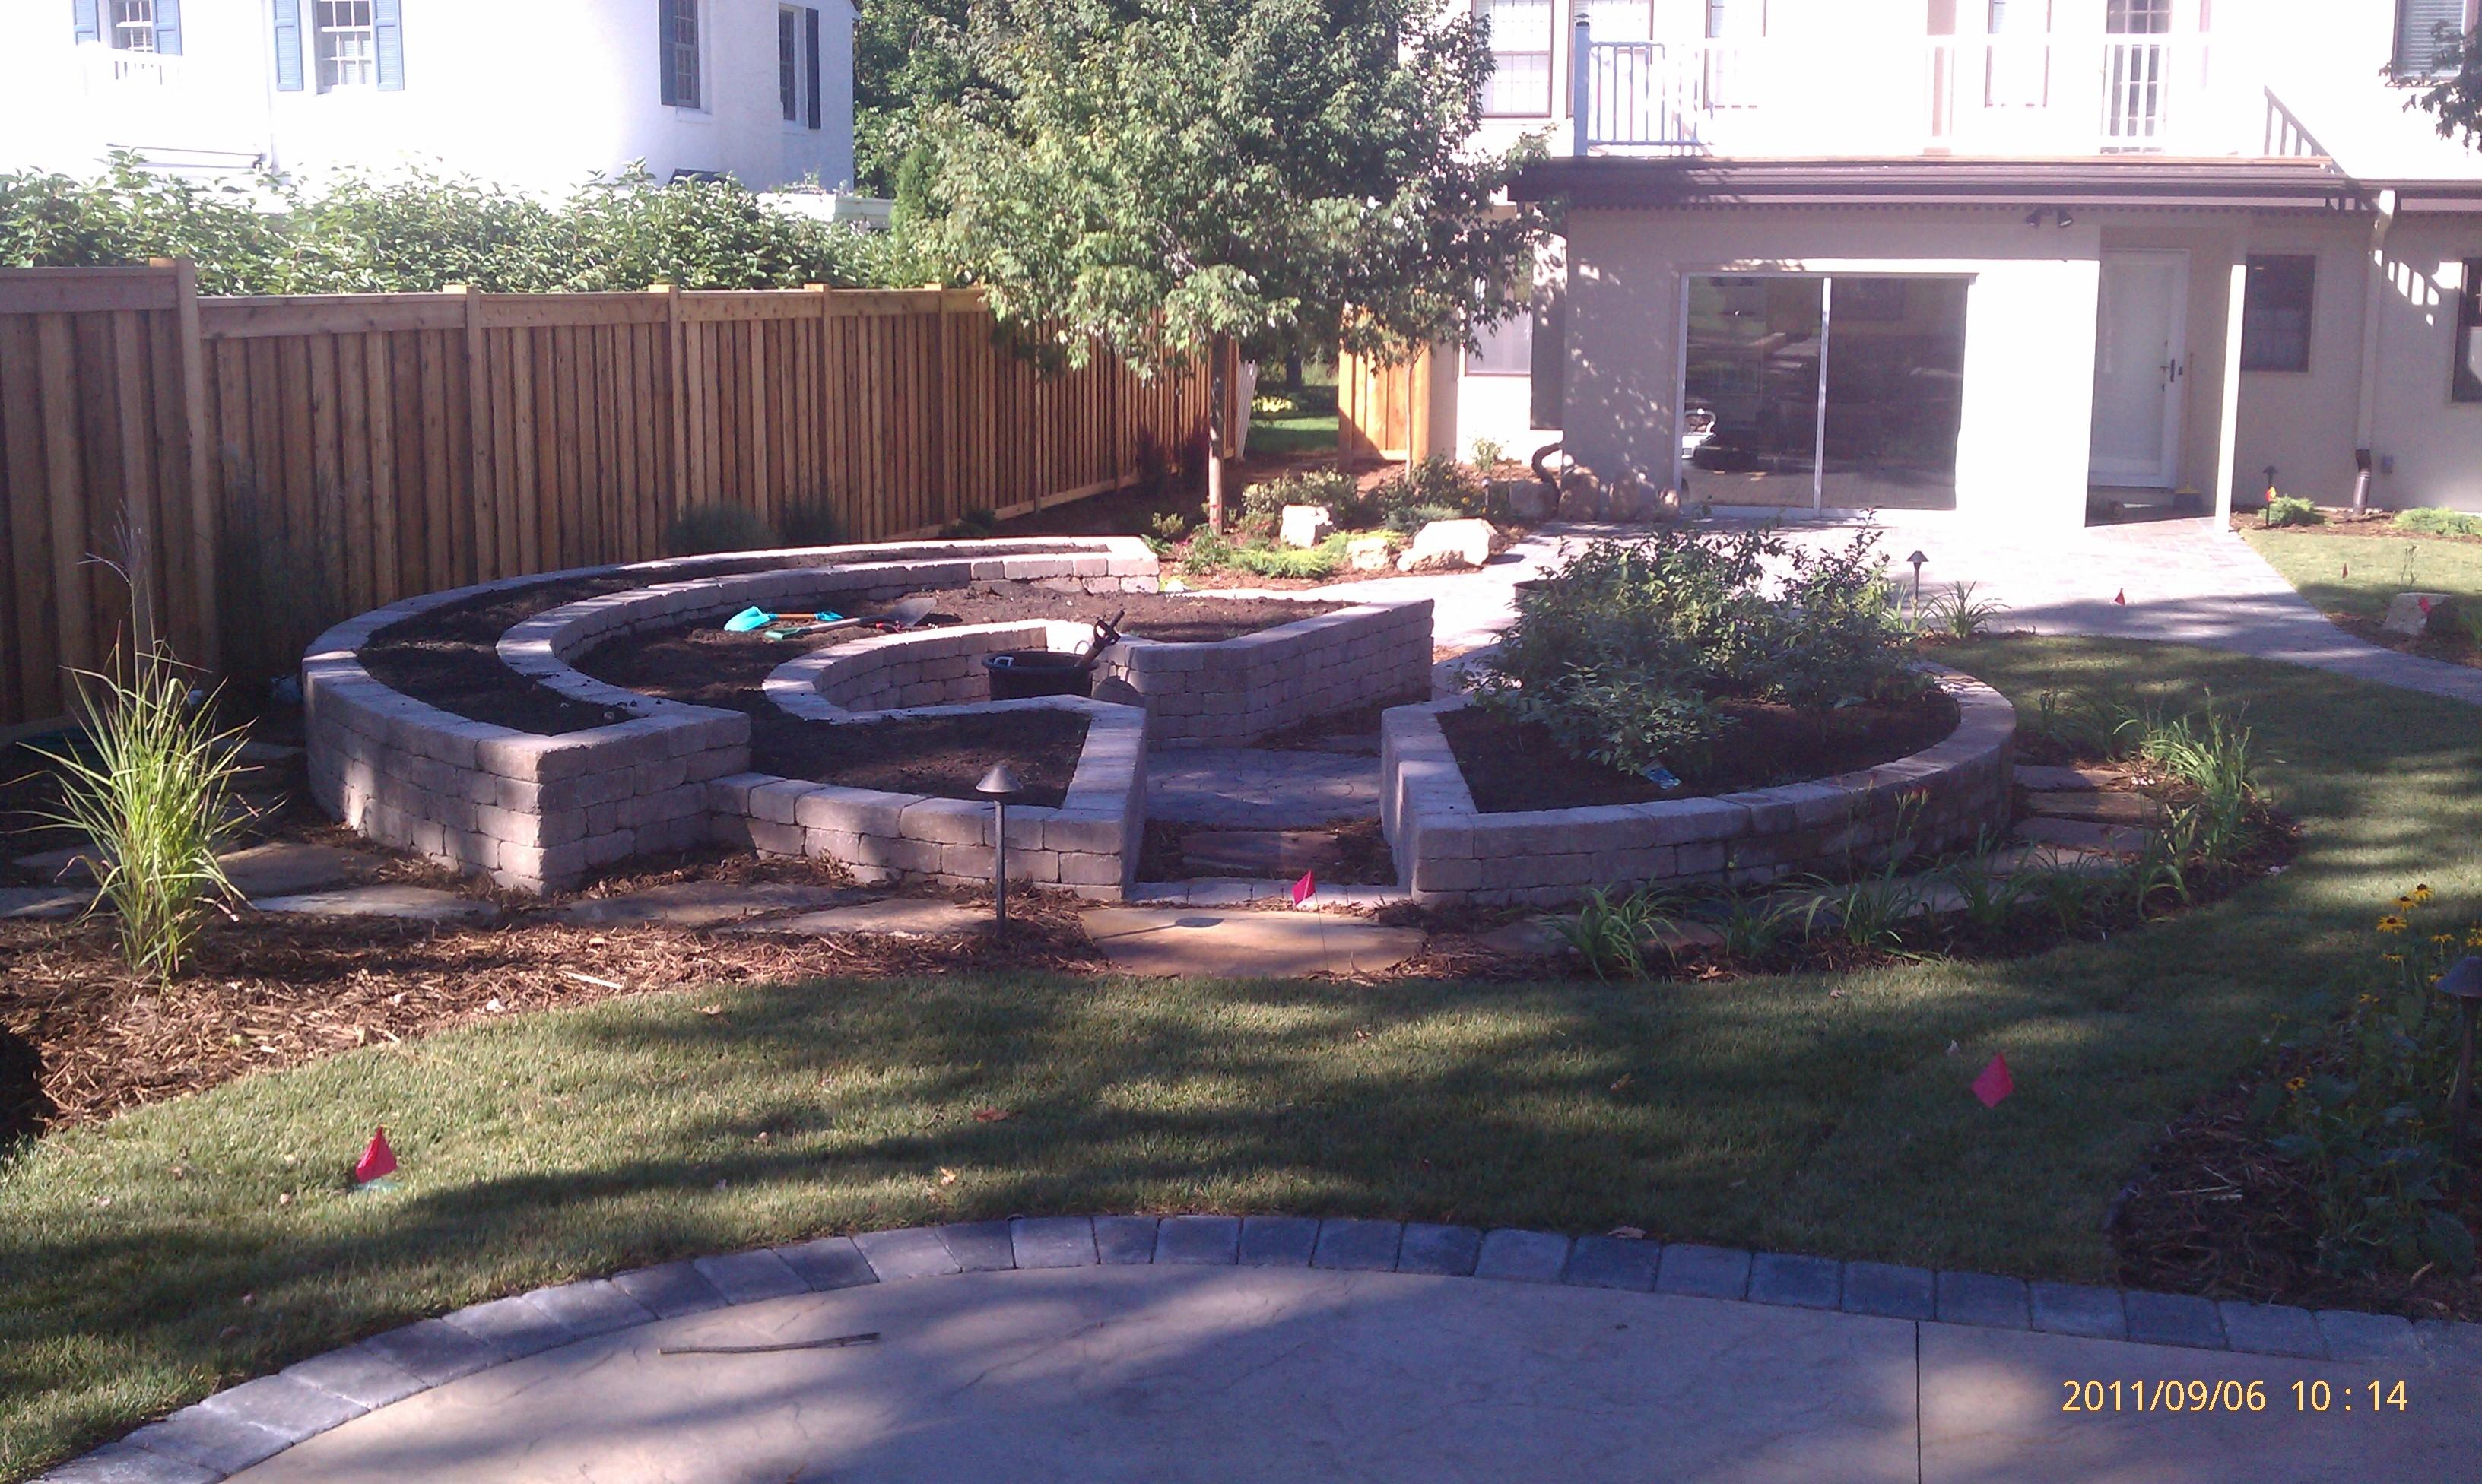 Landscaping Boulders Houston : Huis muur landscape boulders for sale in houston